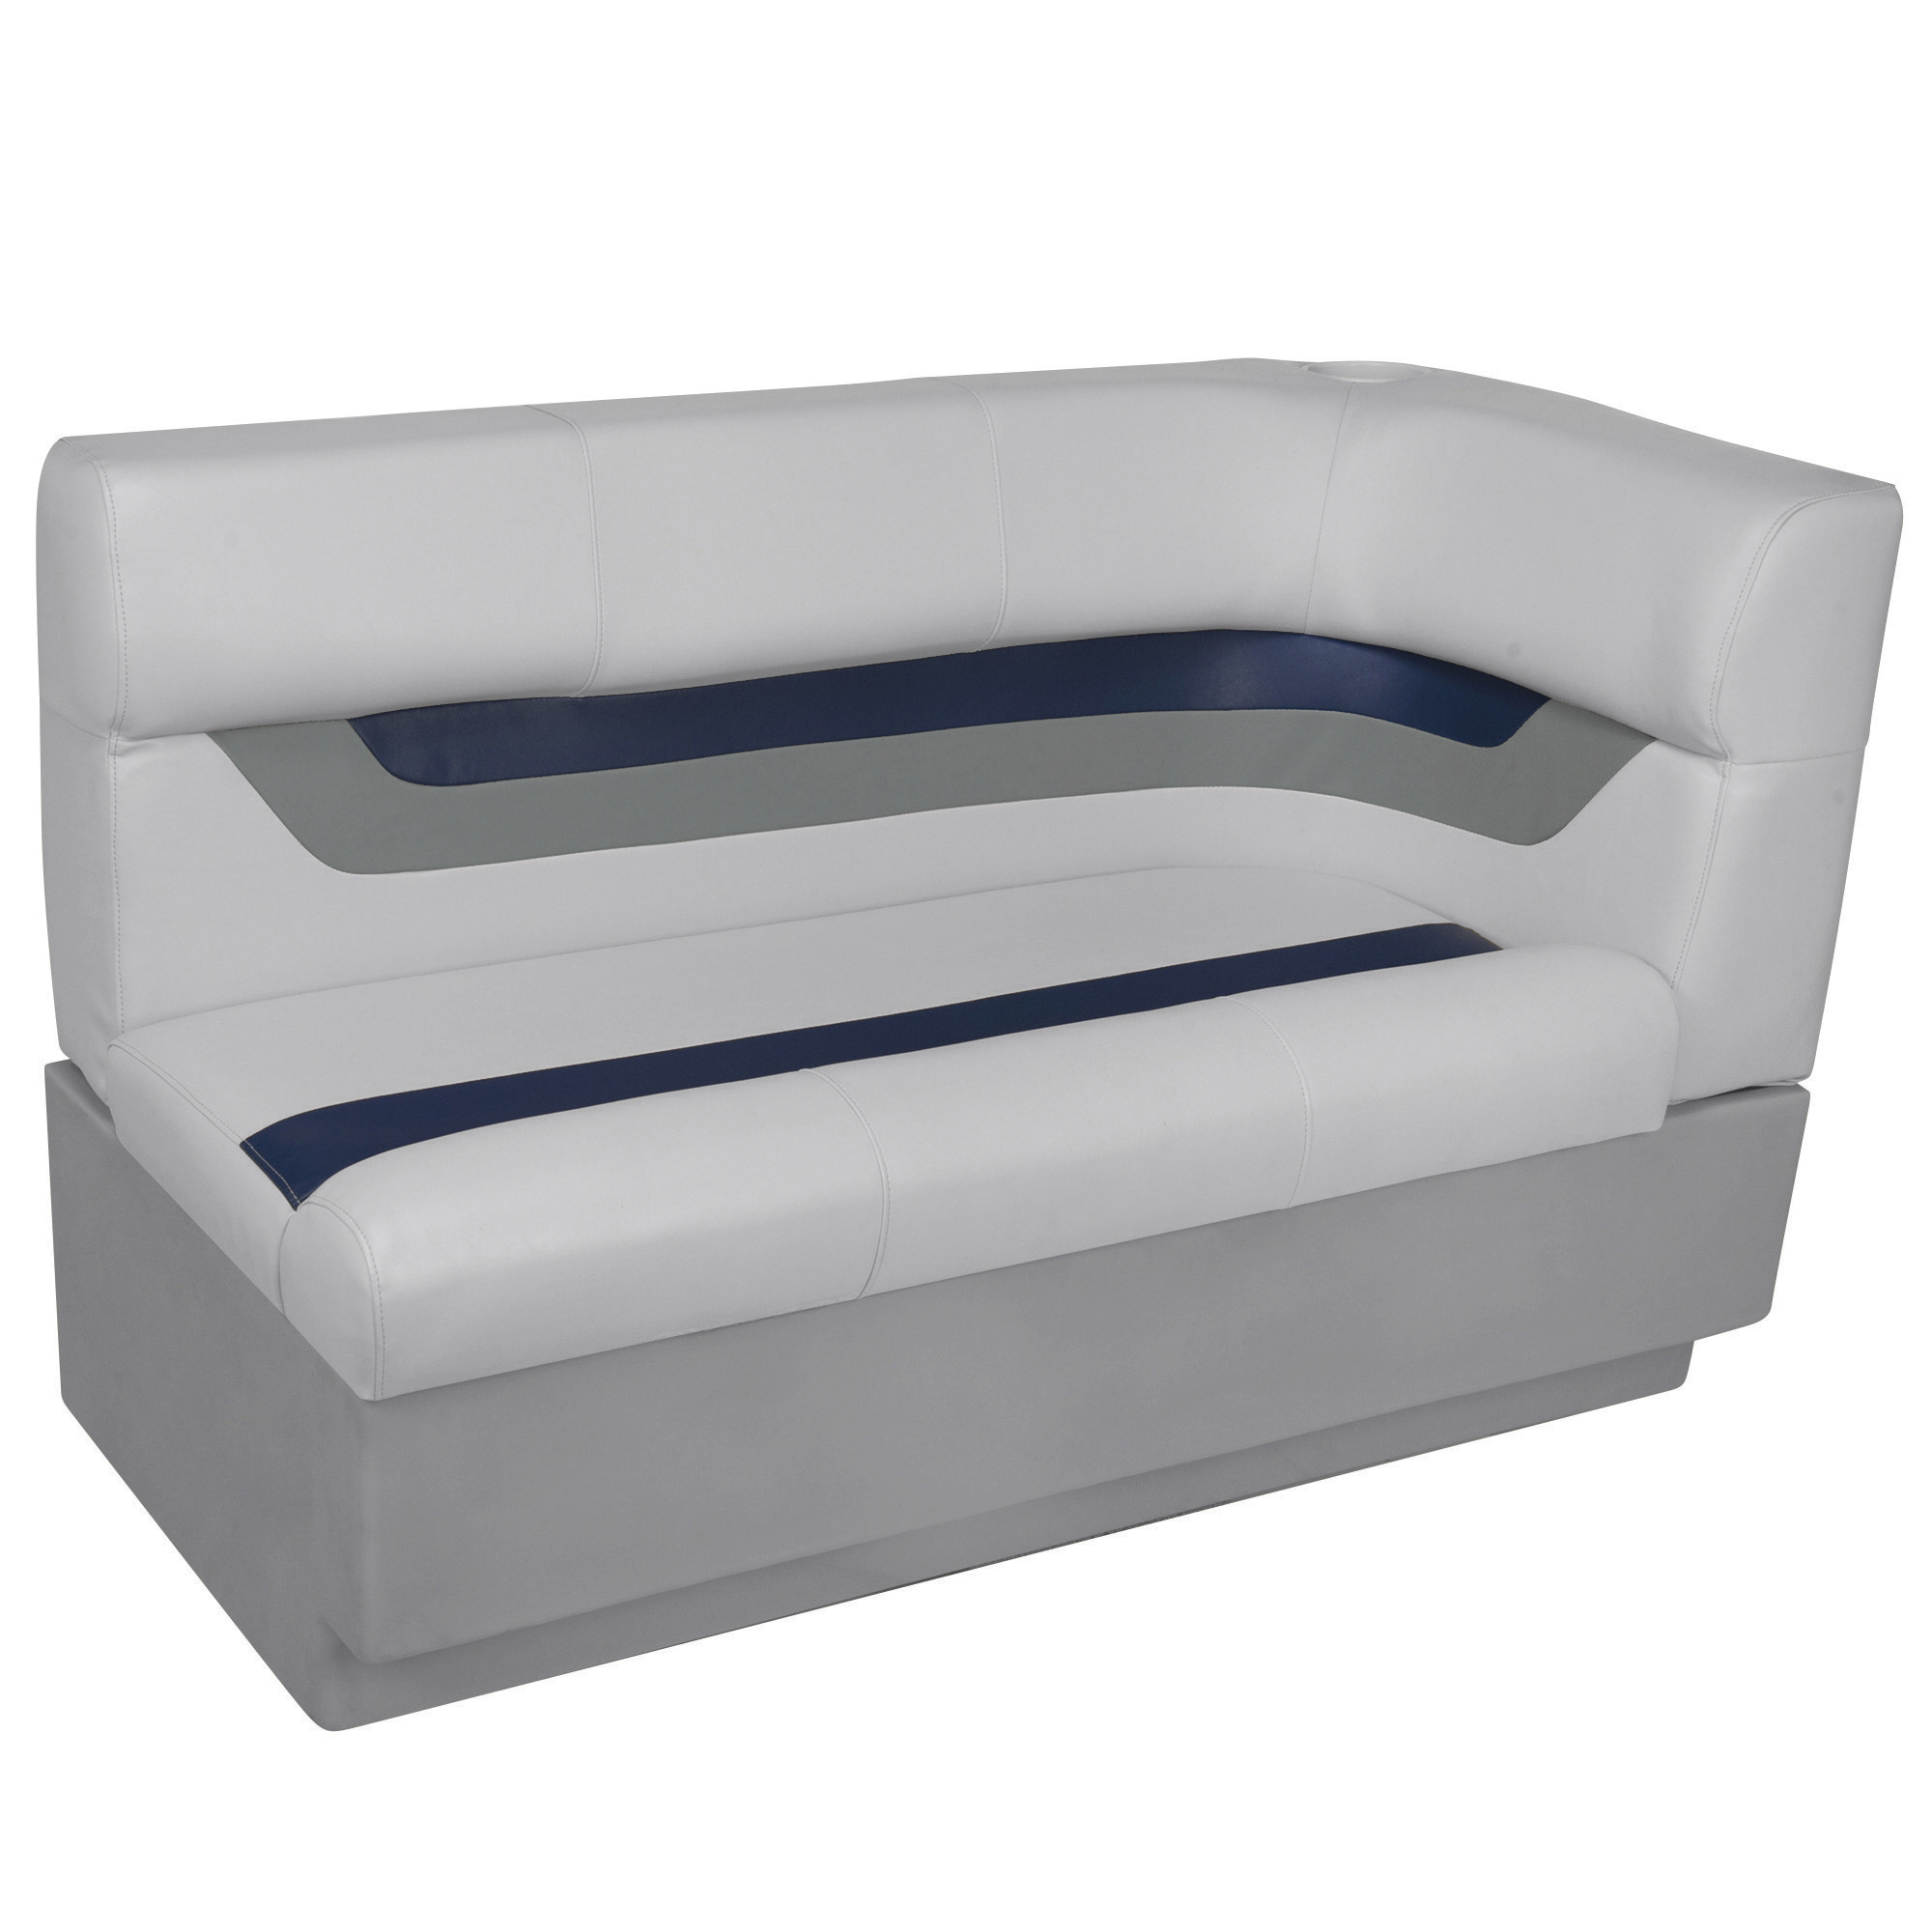 Toonmate Designer Pontoon Left-Side Corner Couch - TOP ONLY - Sky Gray/Navy